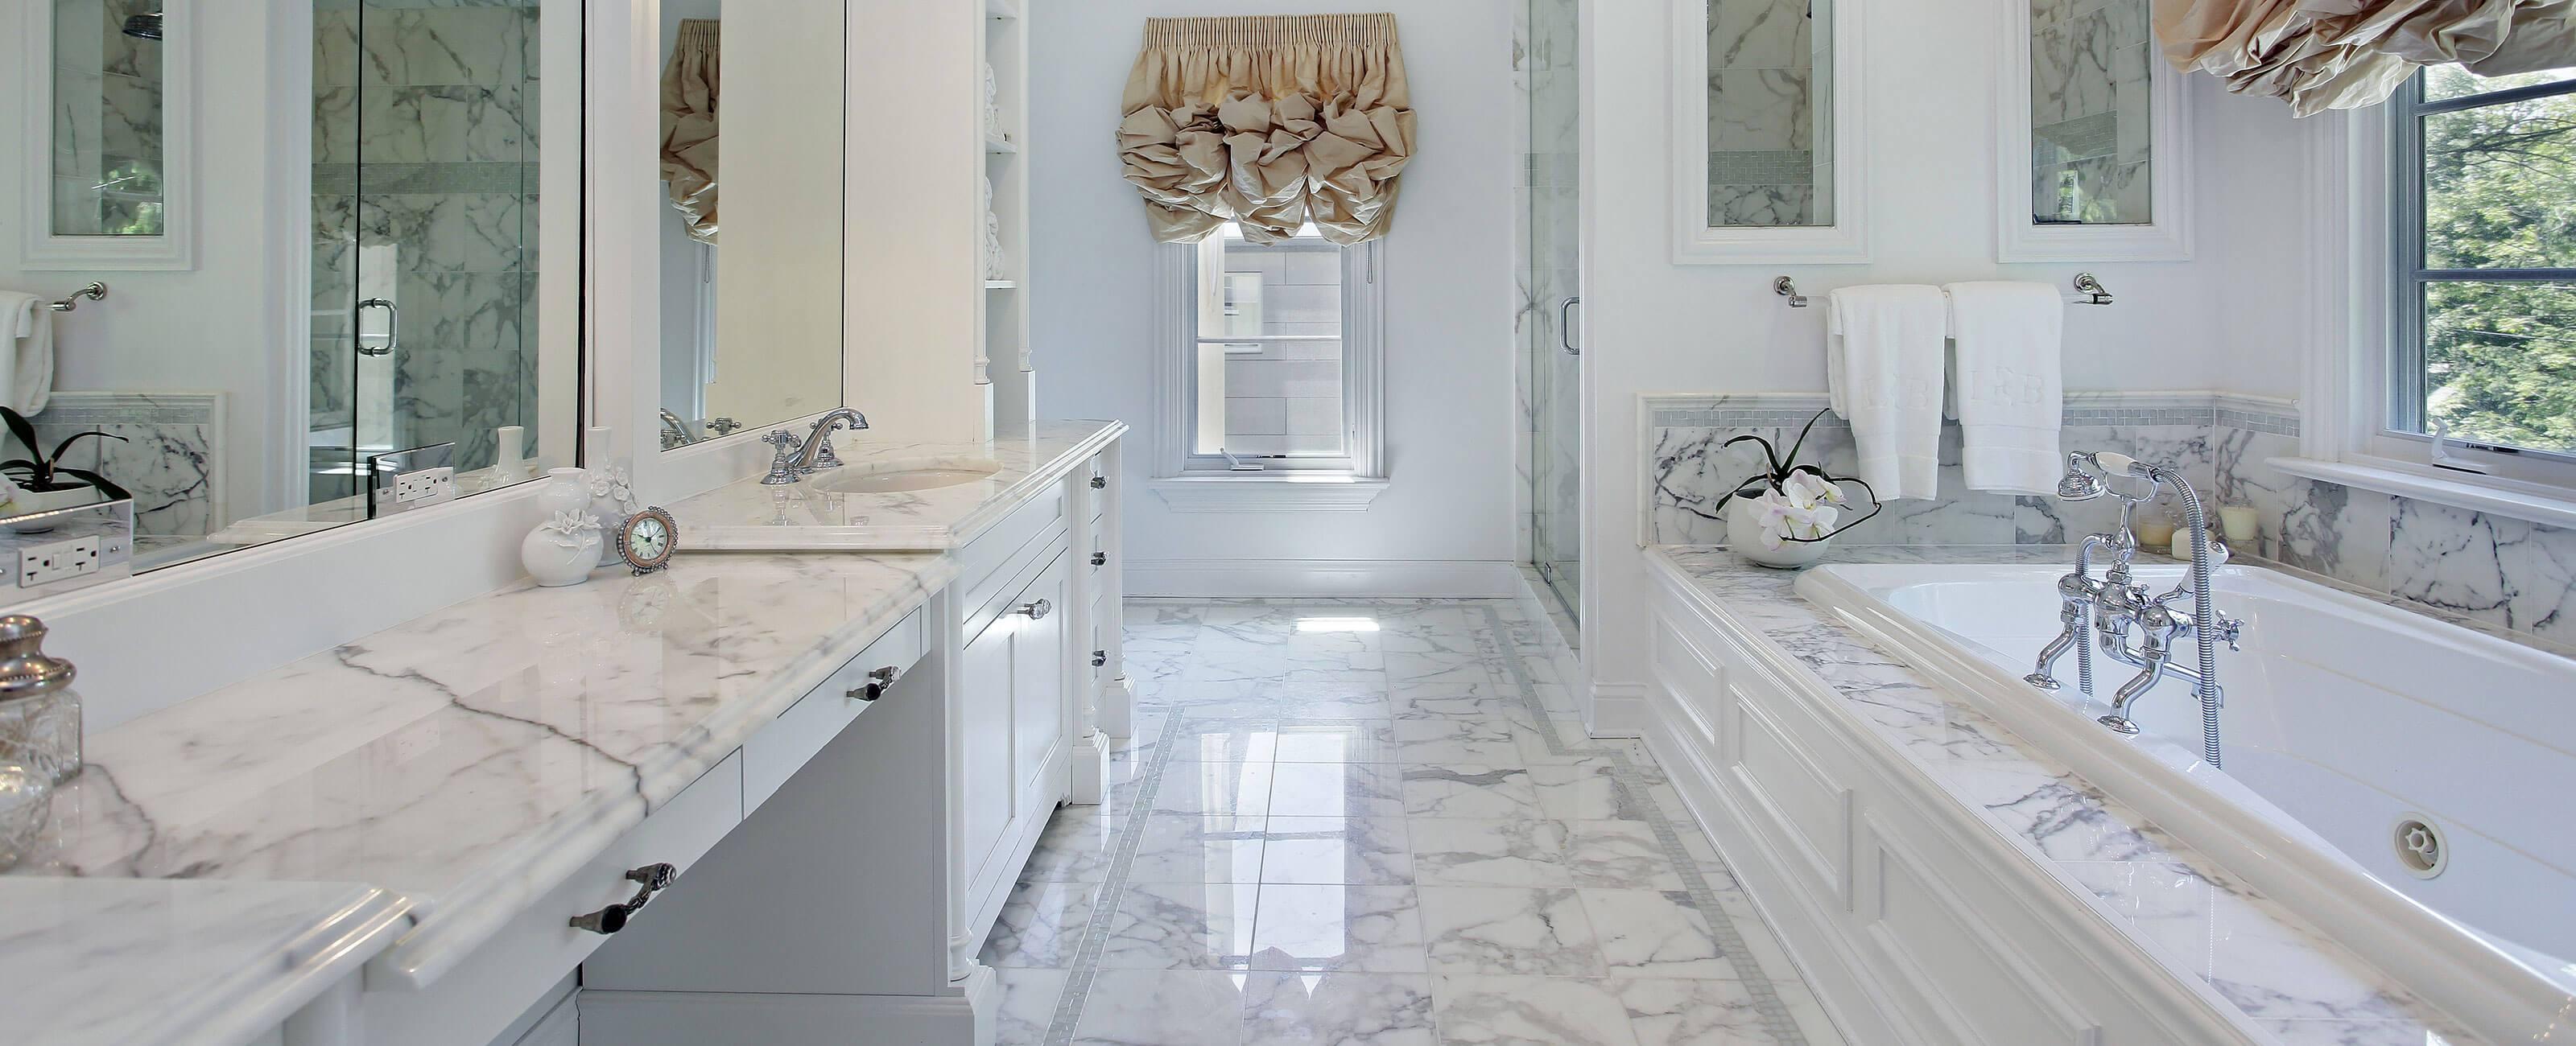 Baderom med gulv og benkeplate i marmor. Foto.